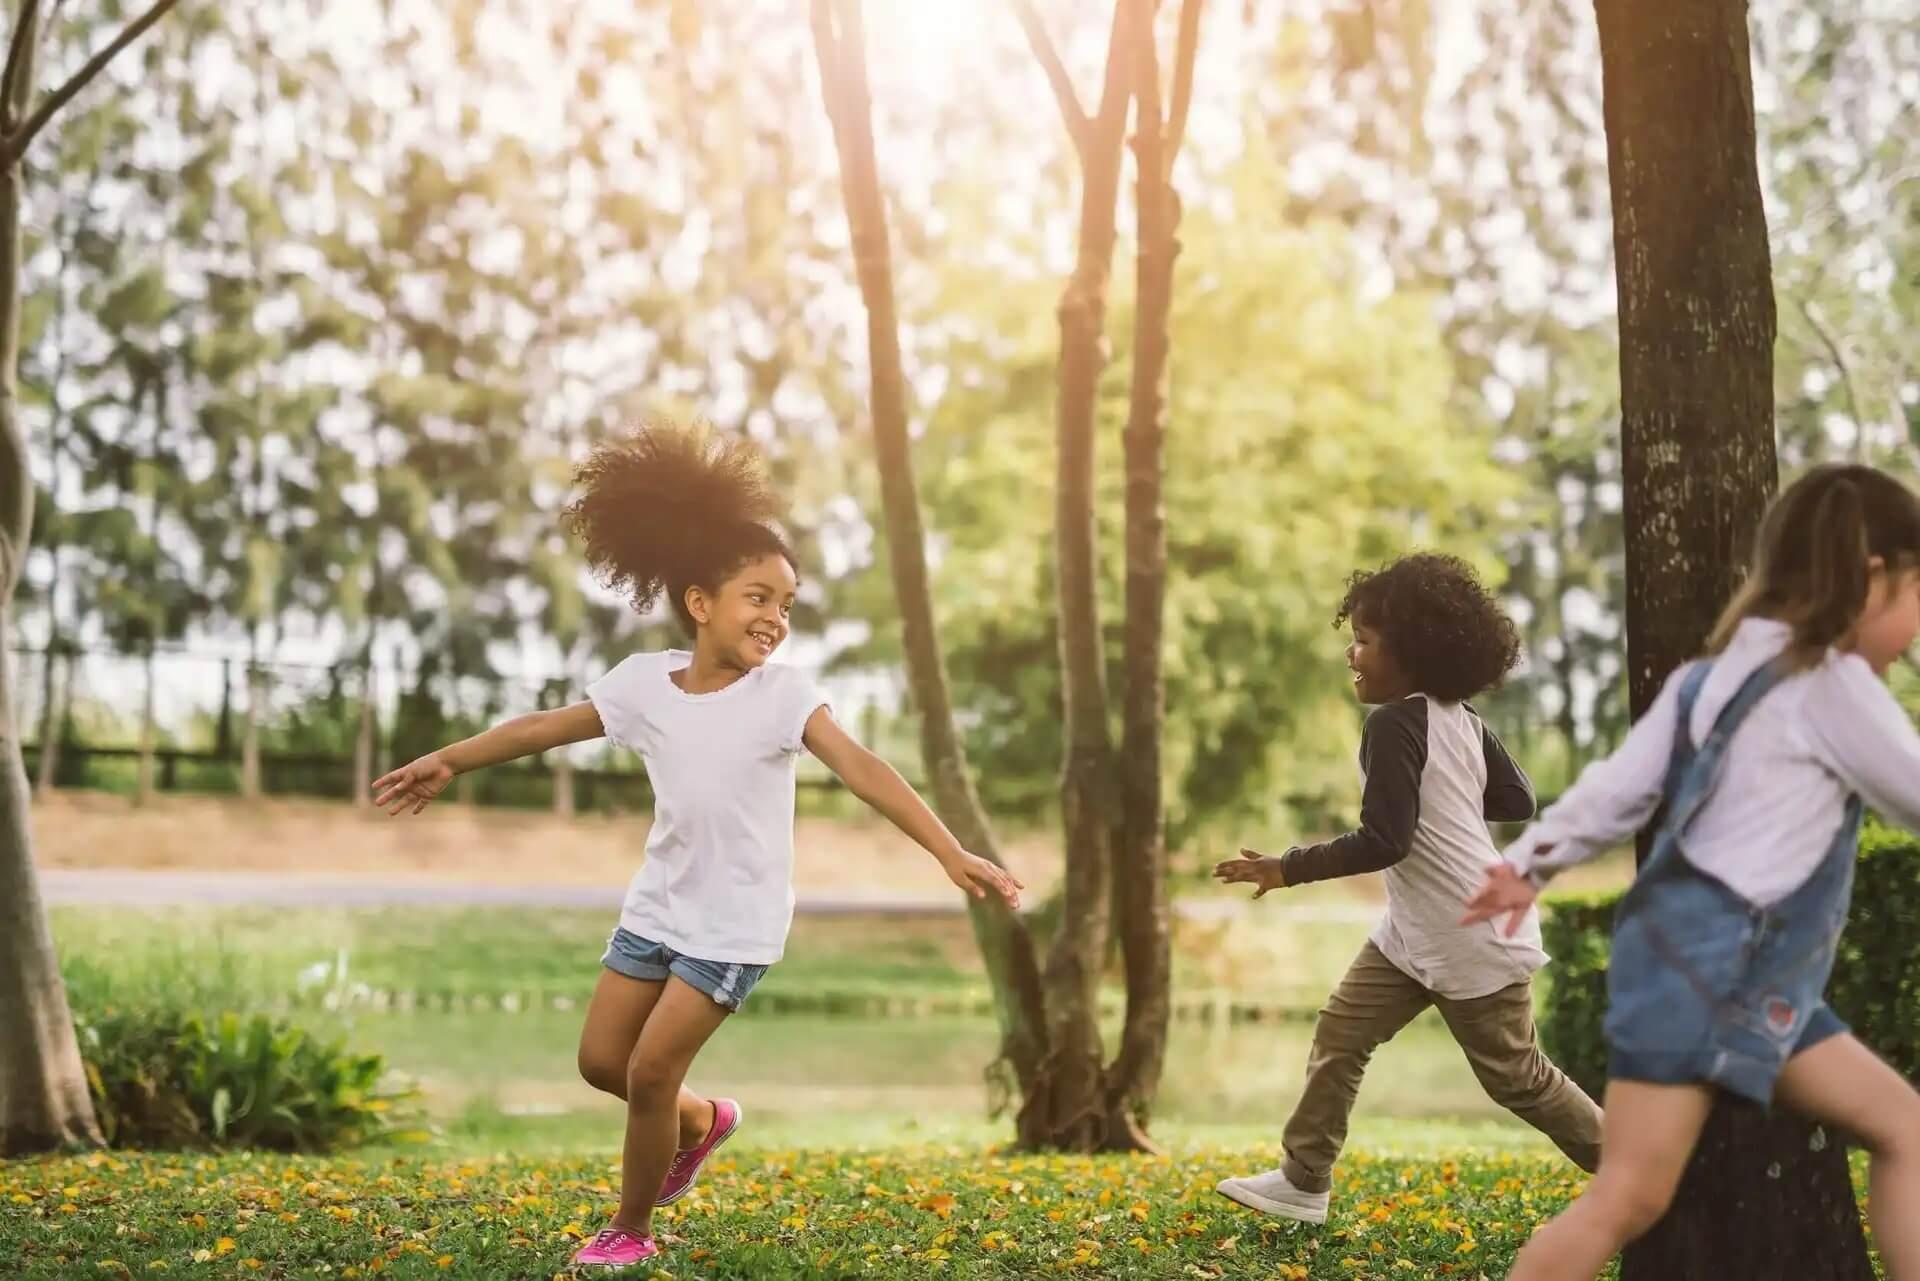 Some girls running.